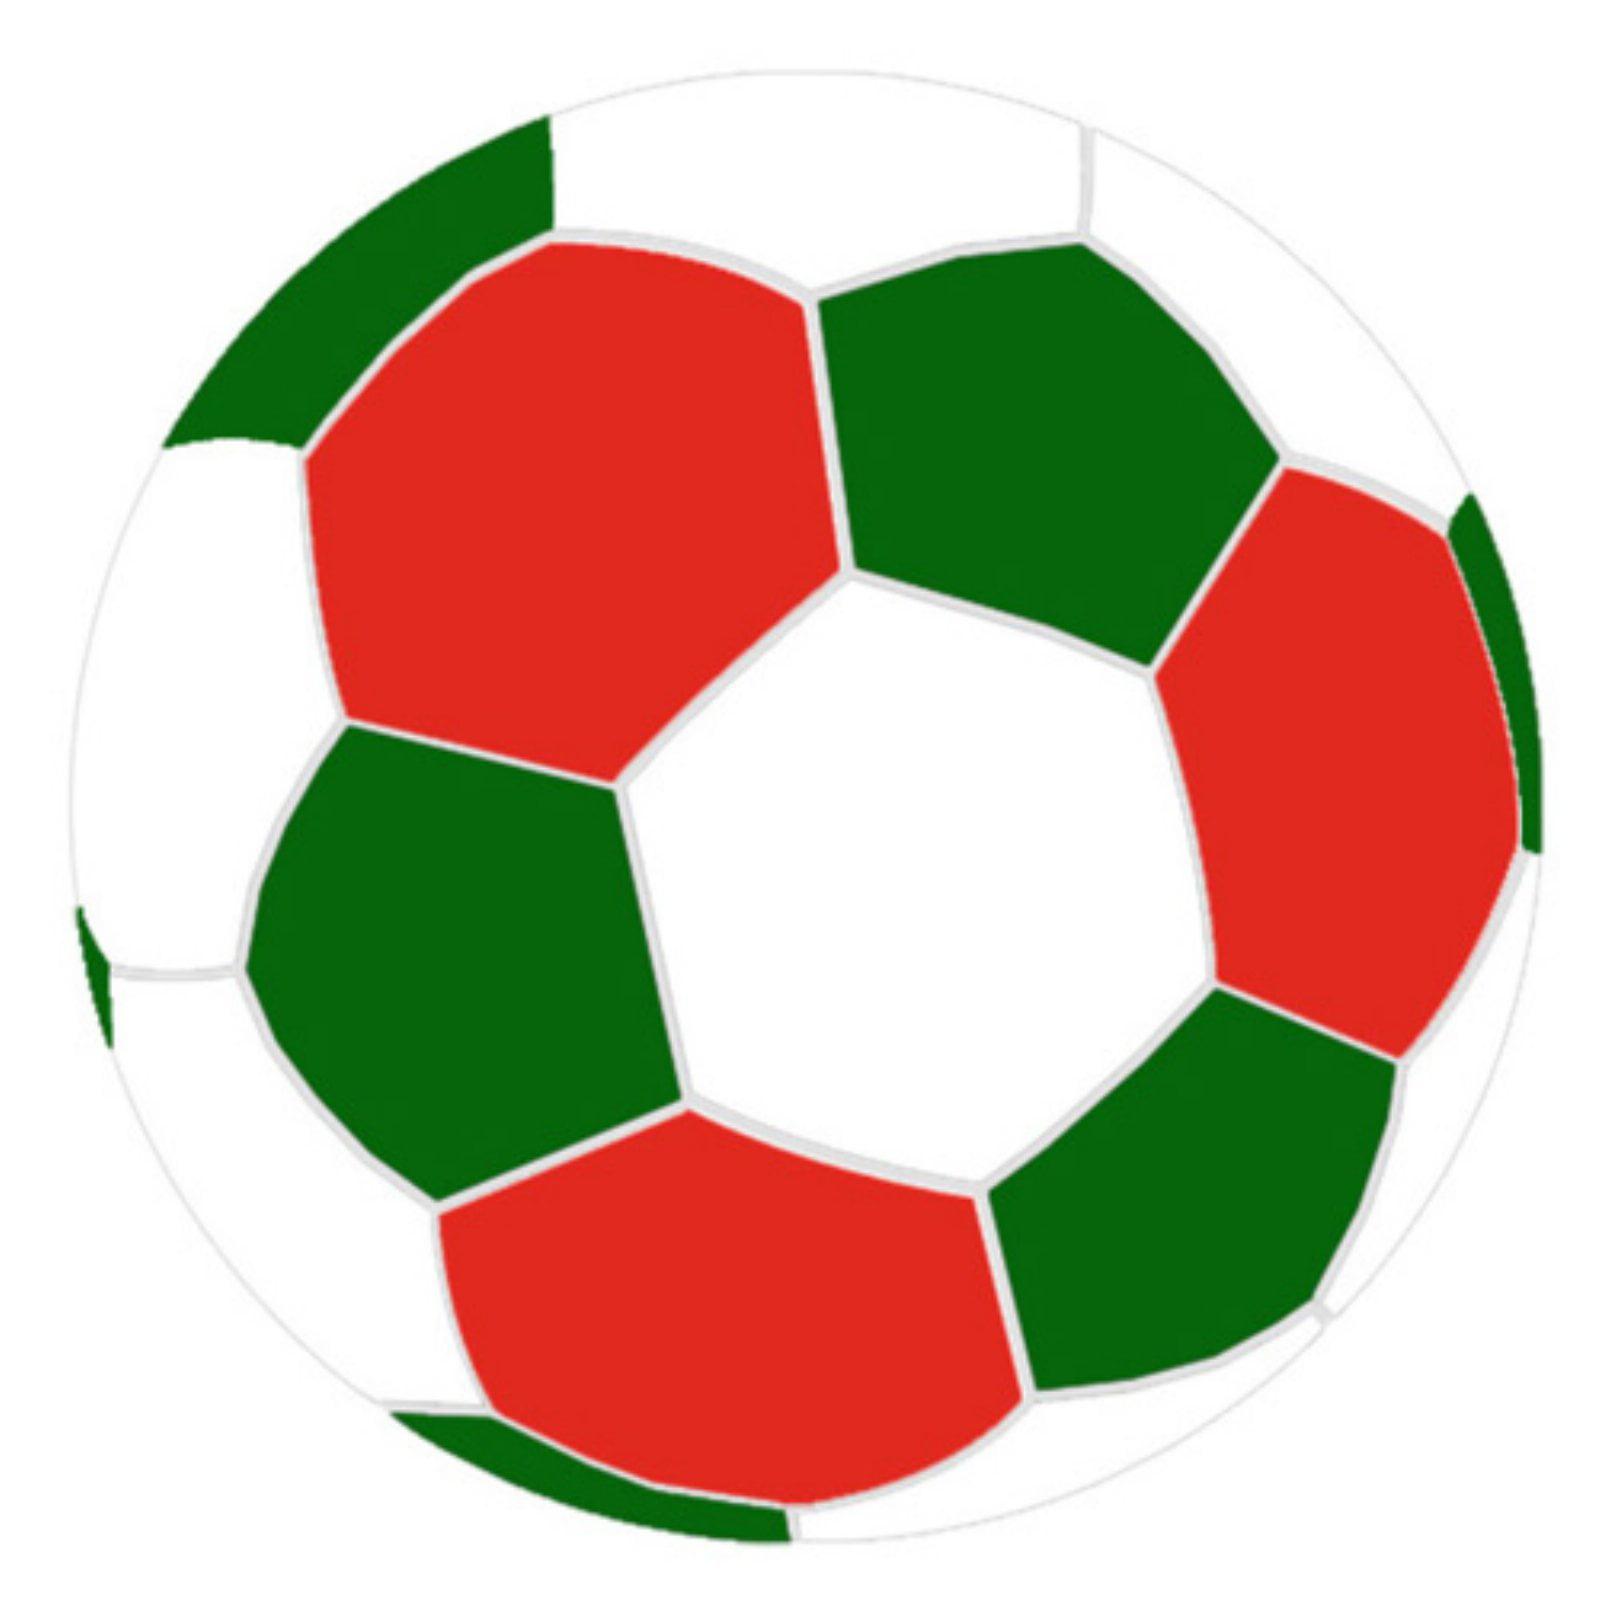 Turbo Beanbags Soccer Ball Large Multicolor Bean Bag Chair